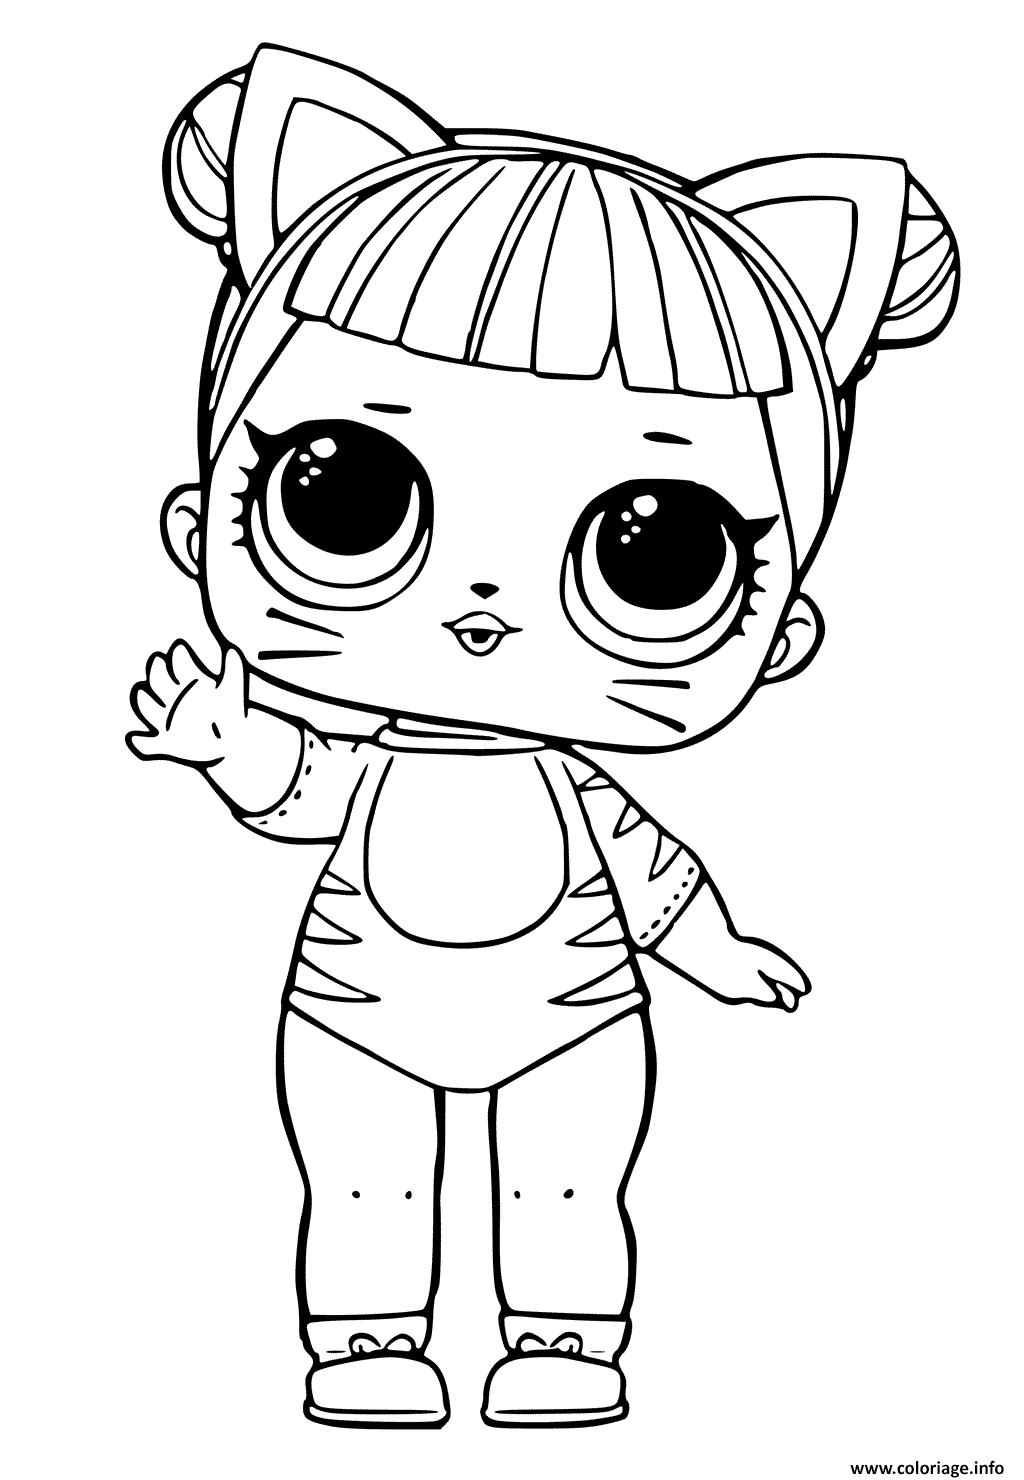 Coloriage Lol Doll Tiger Cat Cute Jecoloriecom